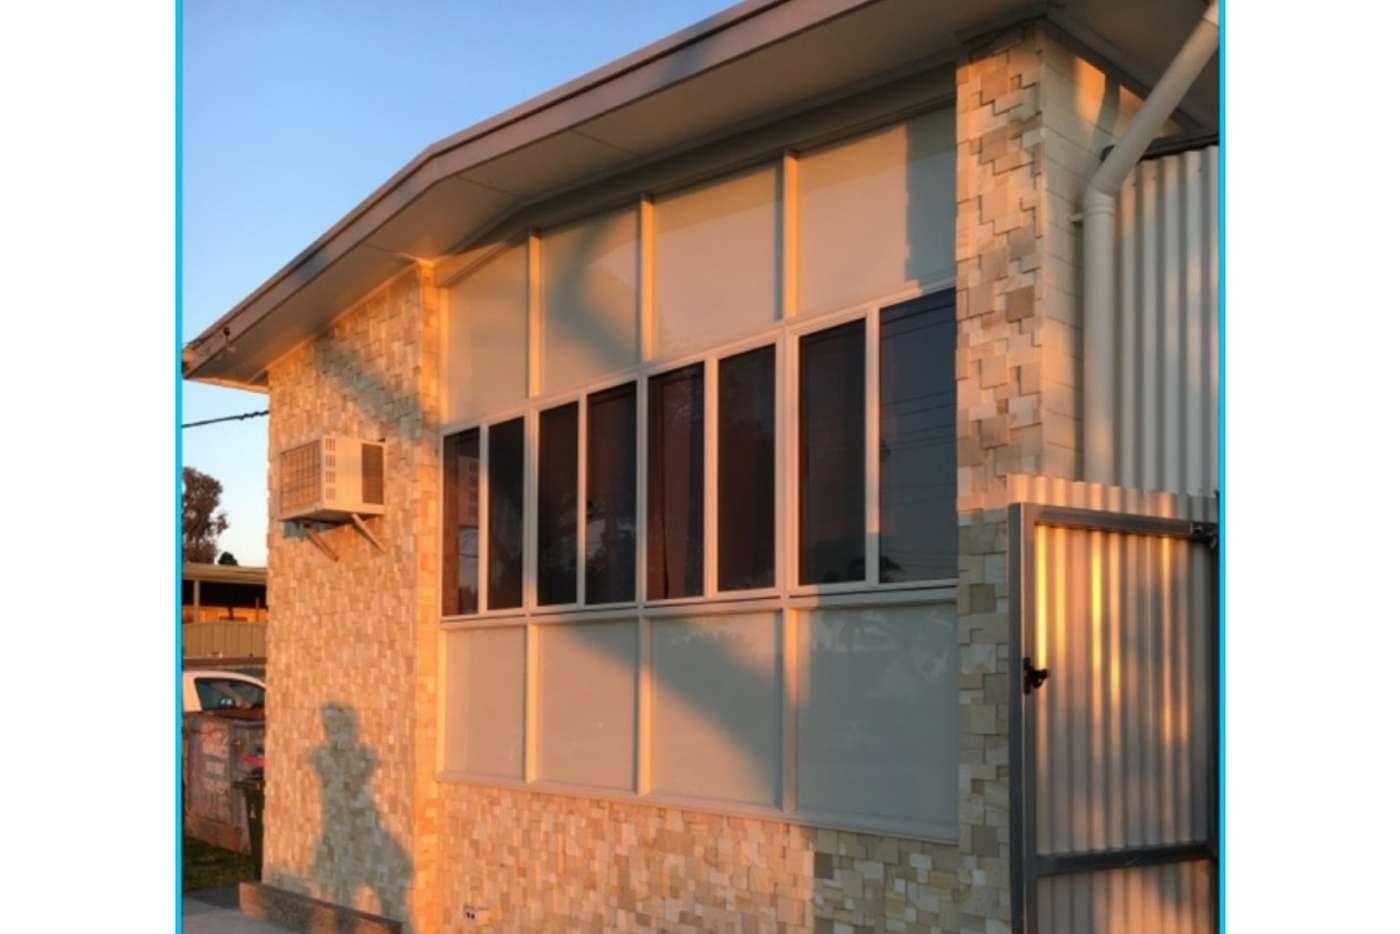 Main view of Homely house listing, 23 Winara Drive, Ingle Farm SA 5098